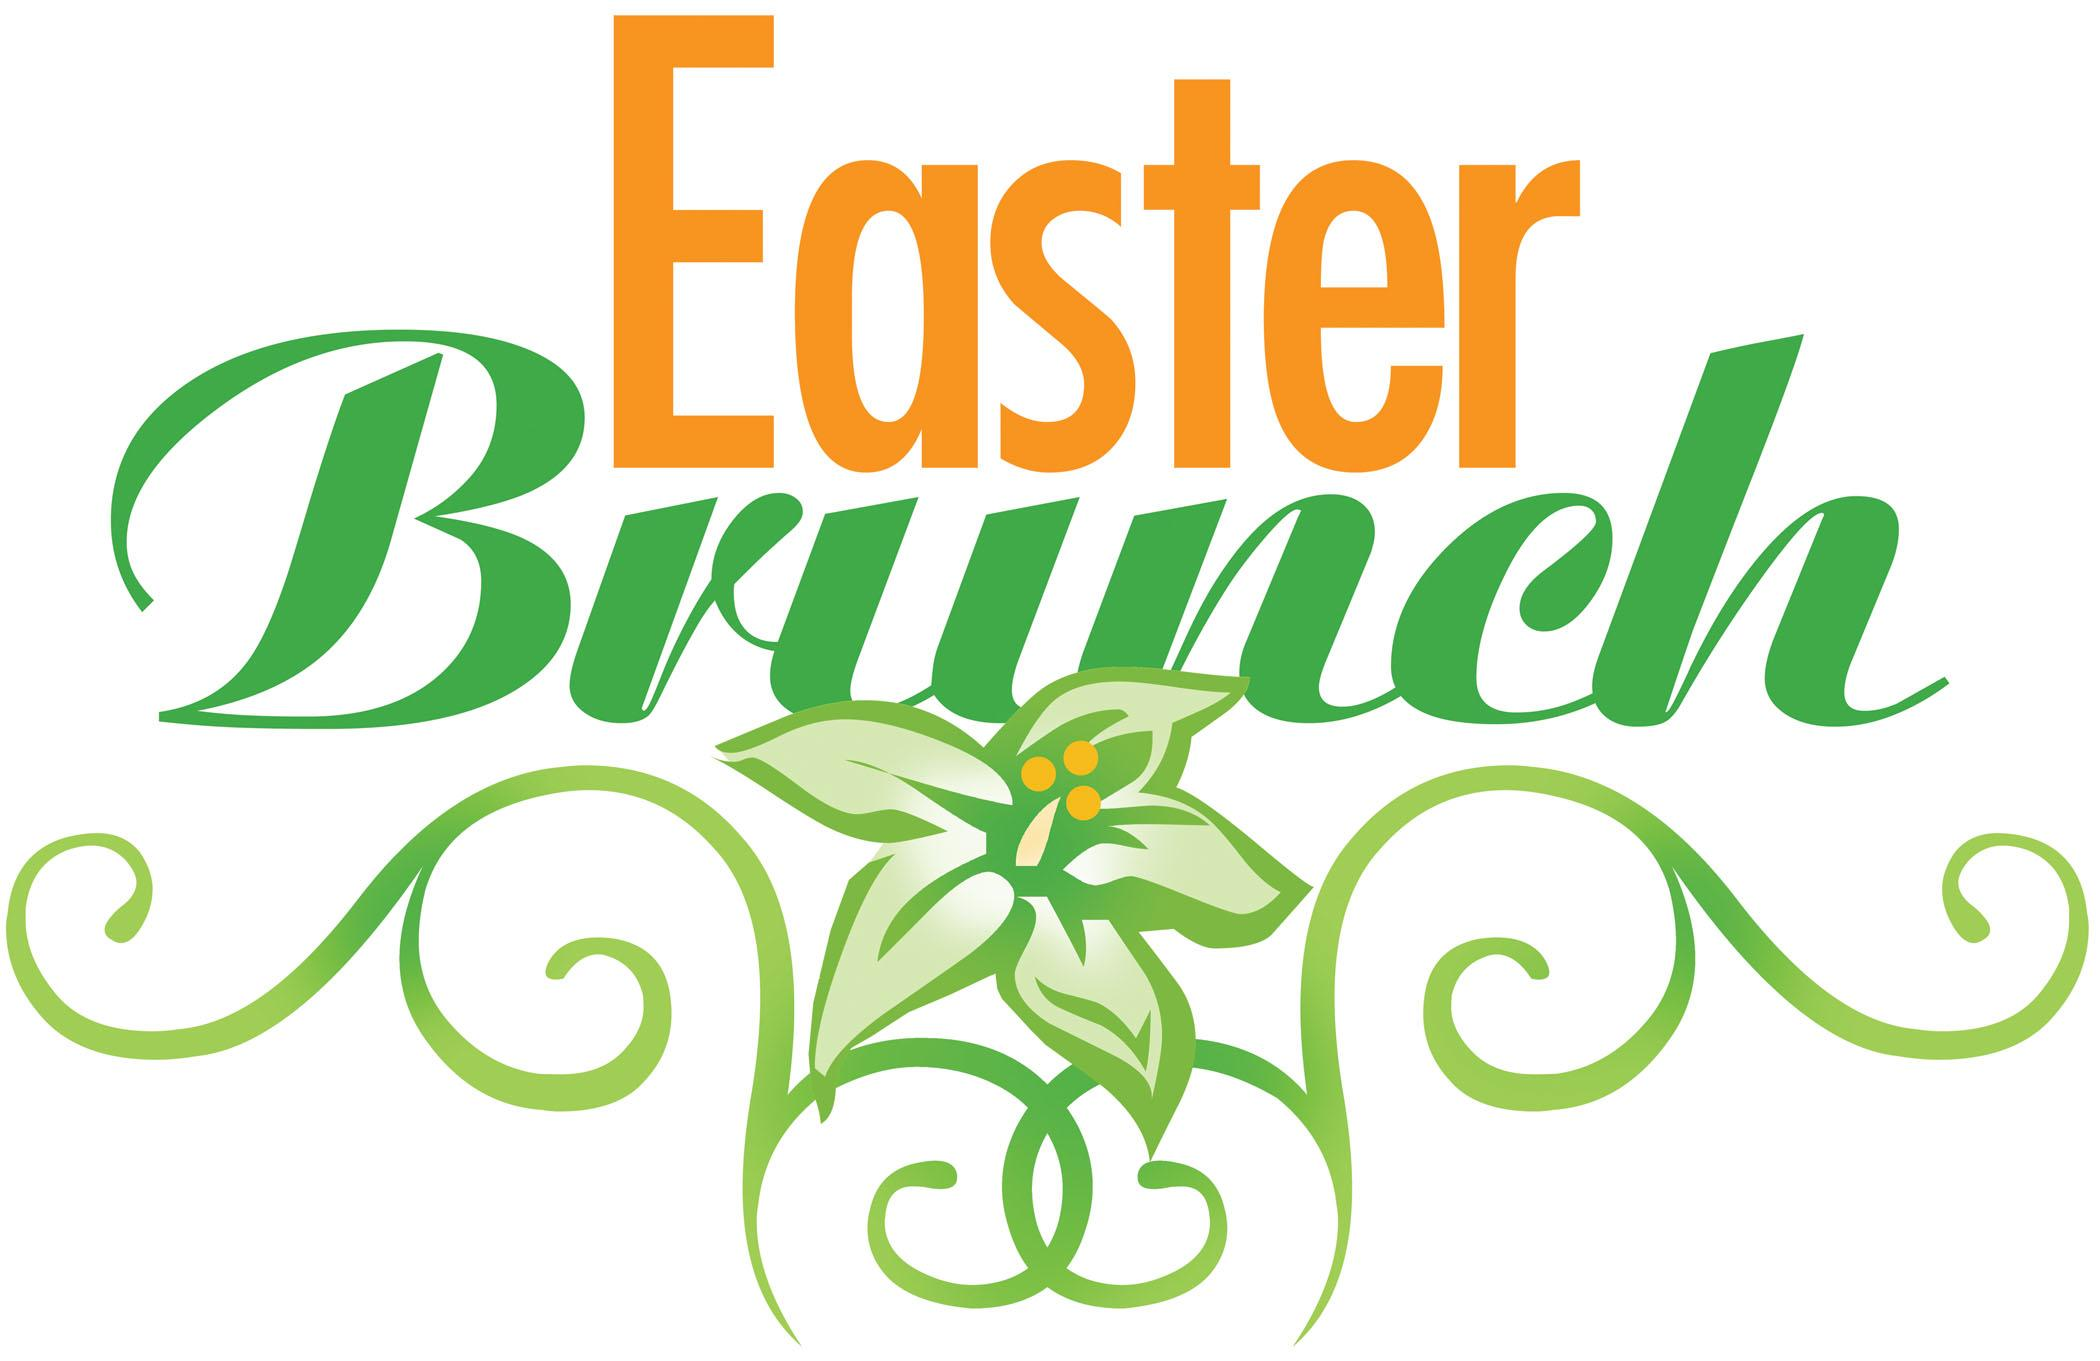 Easter breakfast clipart 6 » Clipart Station.